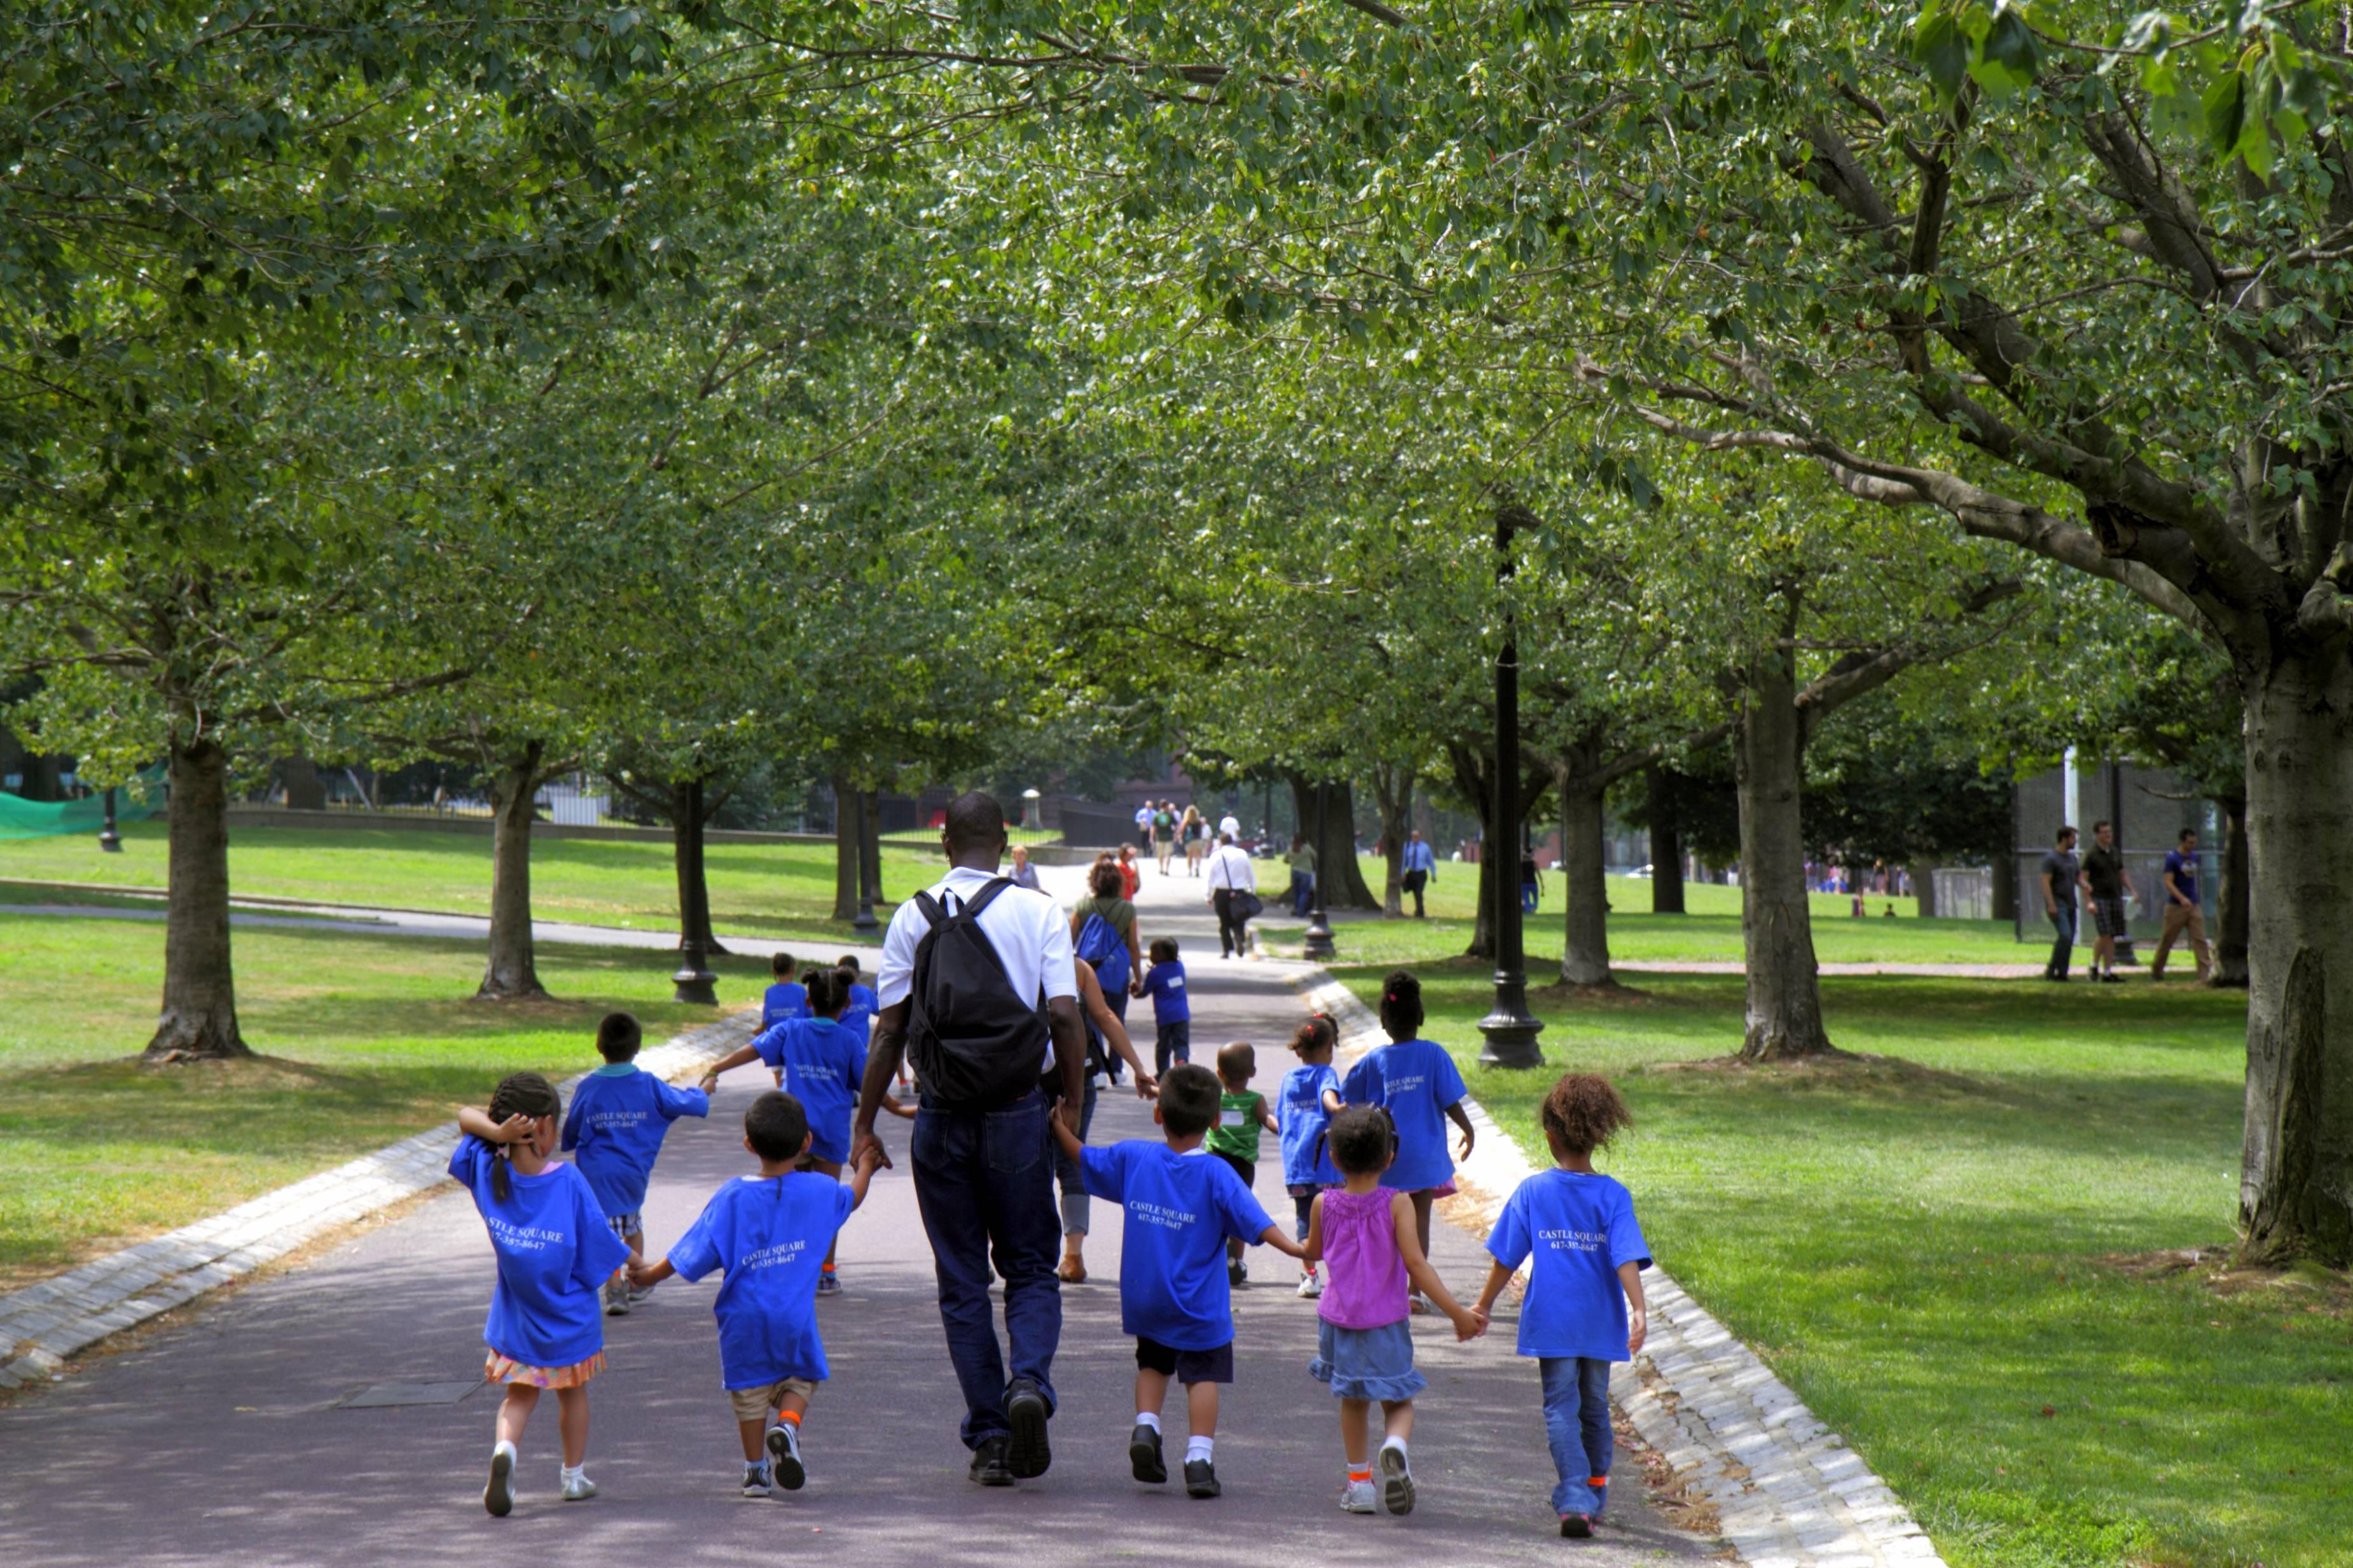 A daycare class walking in a public park in Boston Common.